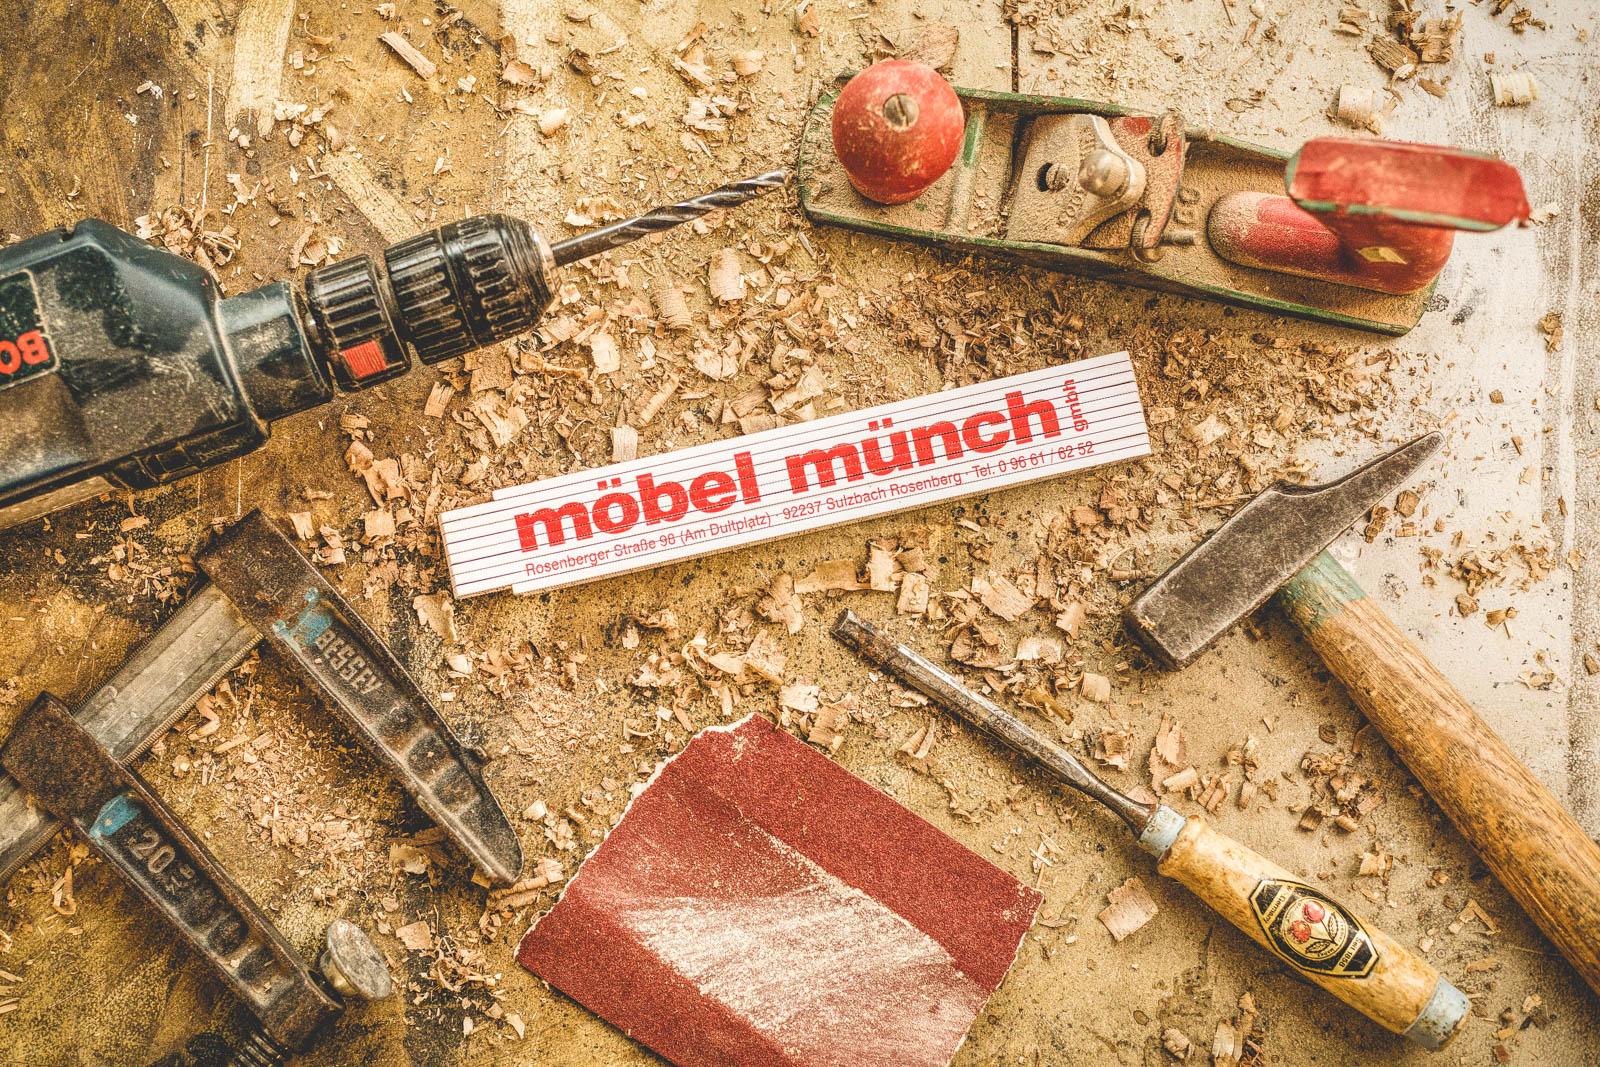 Möbel Böhm boehm i visuelle kommunikation möbel münch